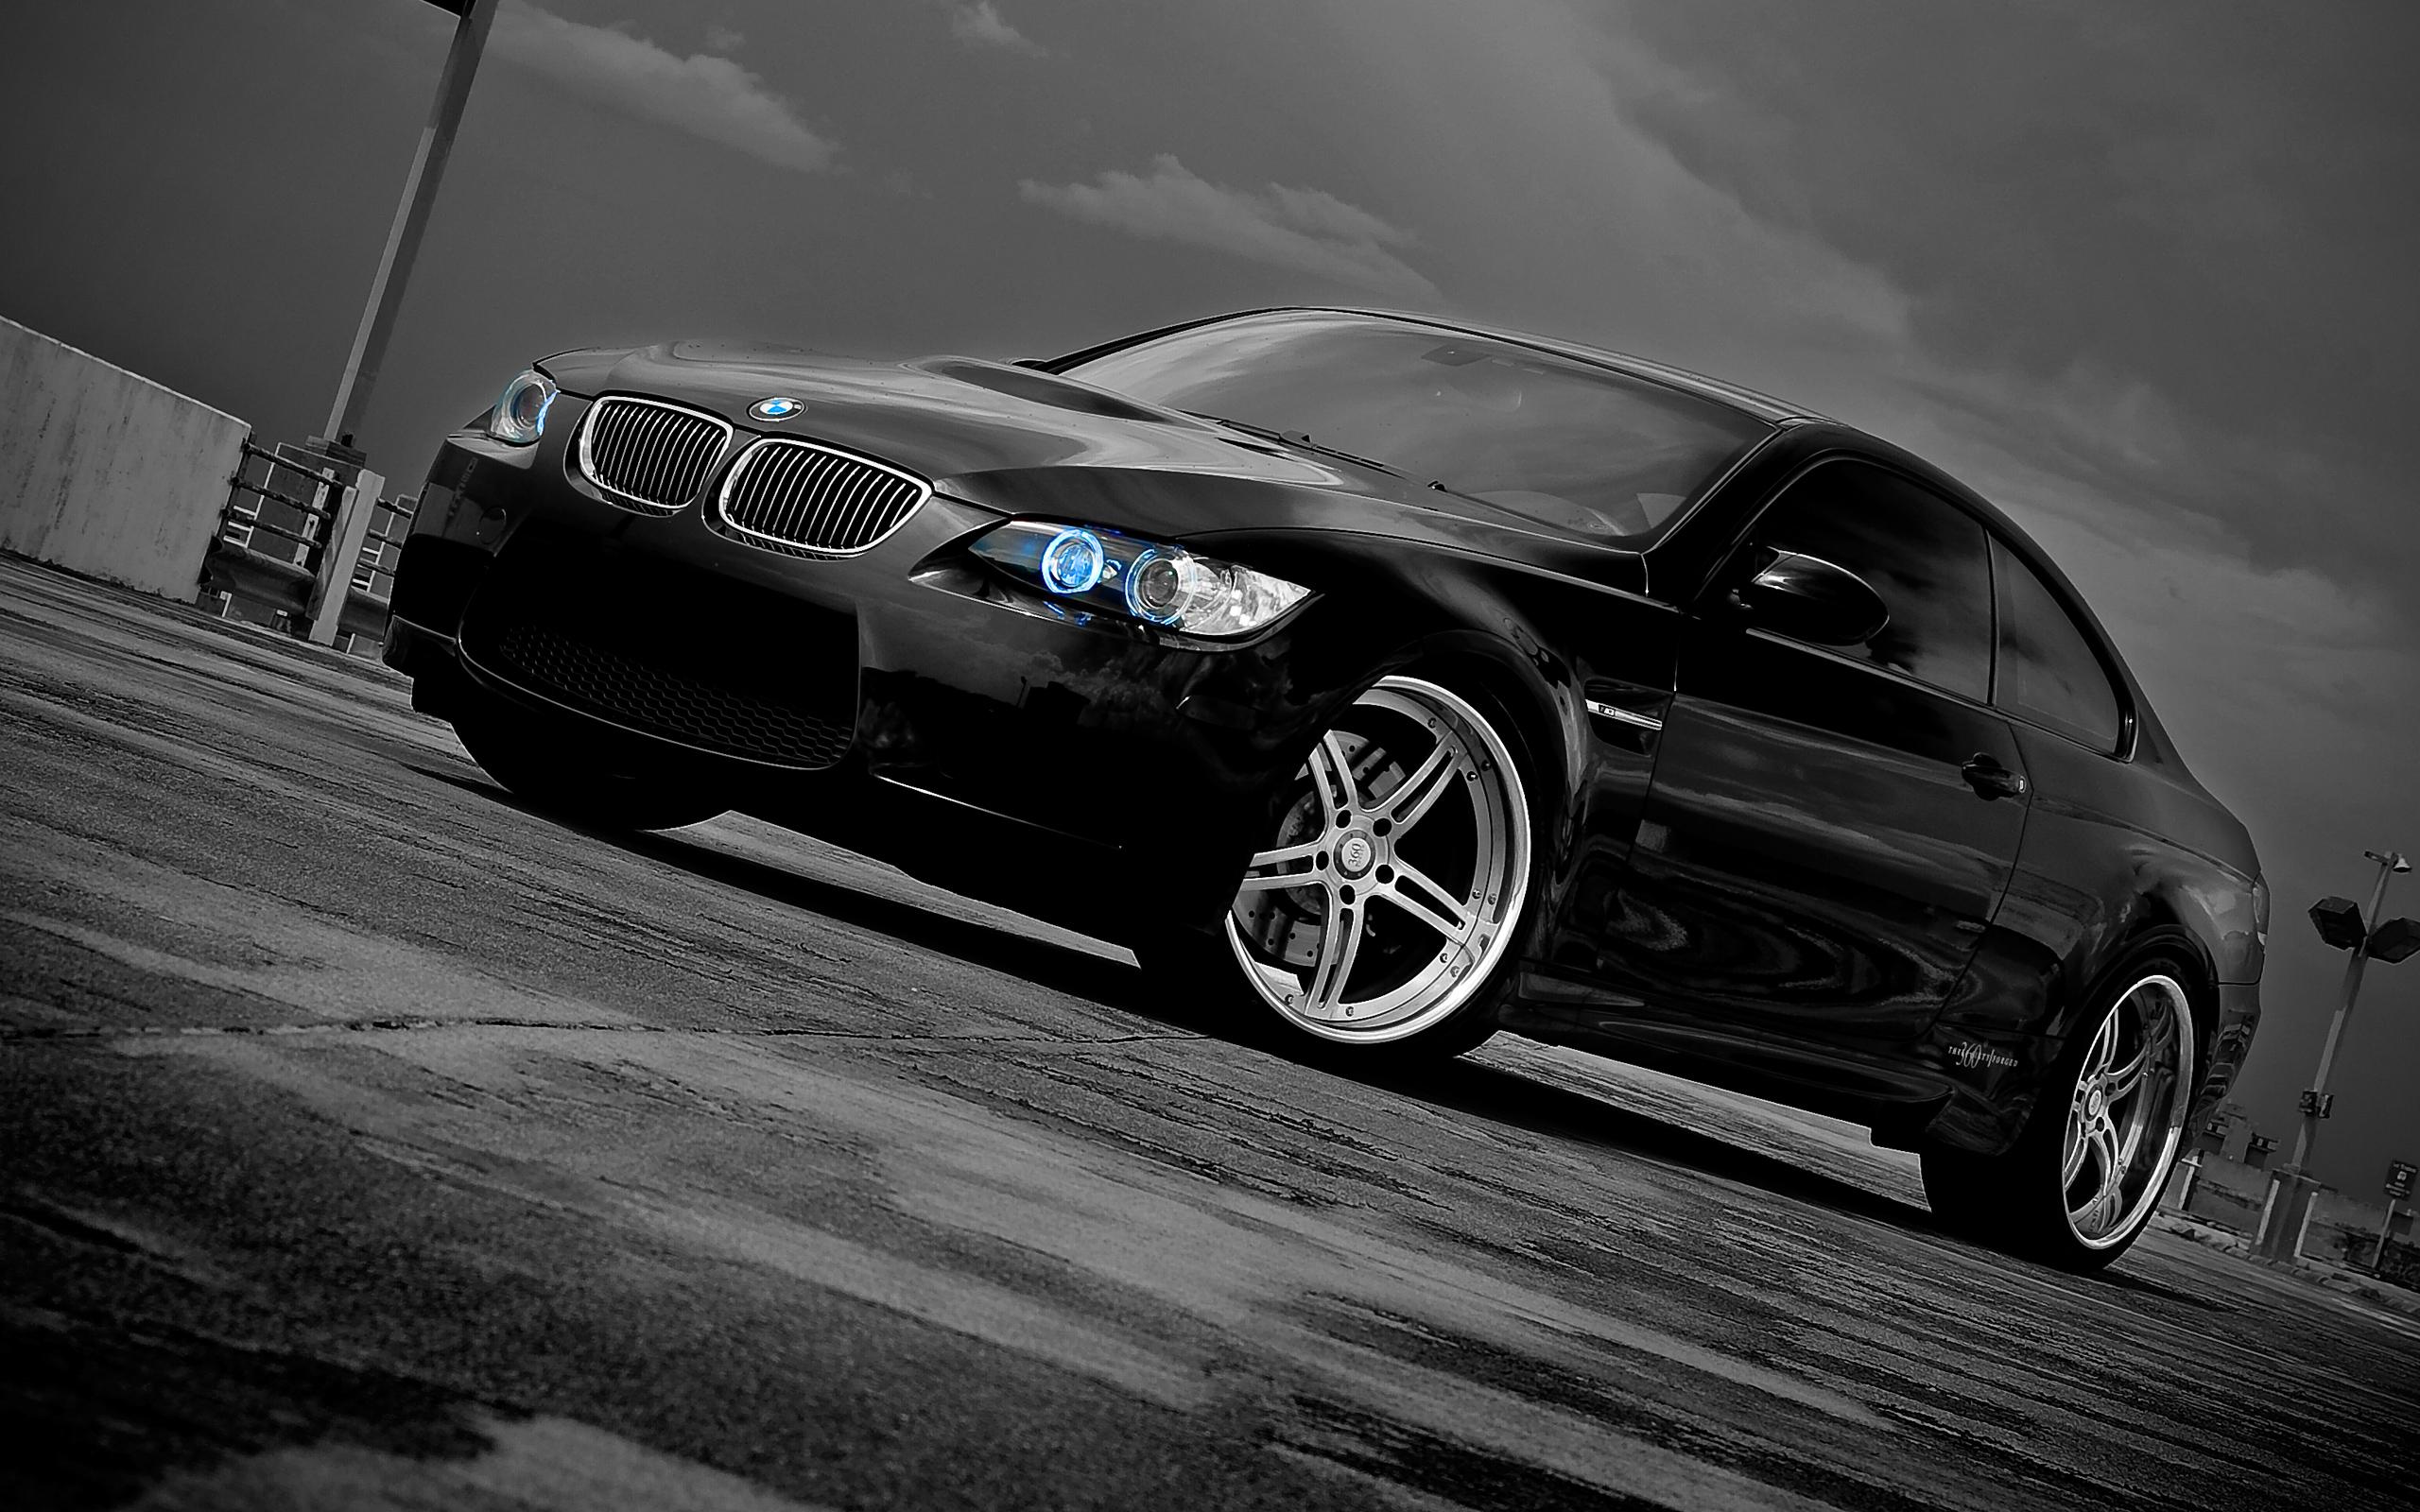 BMW Forged Wheels Wallpaper